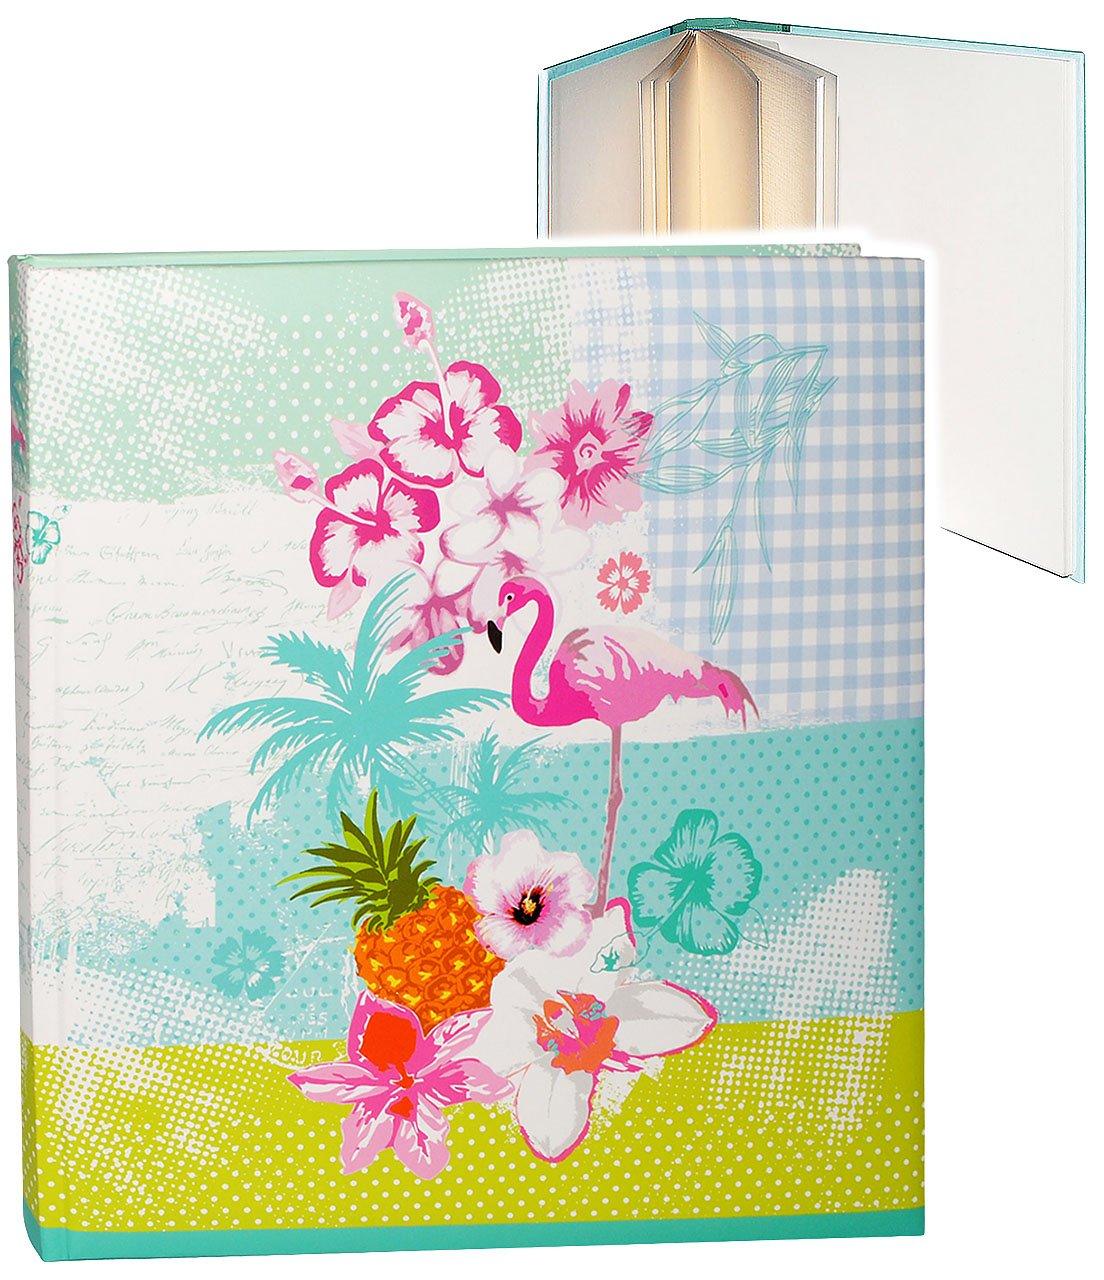 alles-meine.de GmbH XL Fotoalbum - Flamingo & Hibiskus Blume - Hawaii - Incl. Name - Gebunden ..